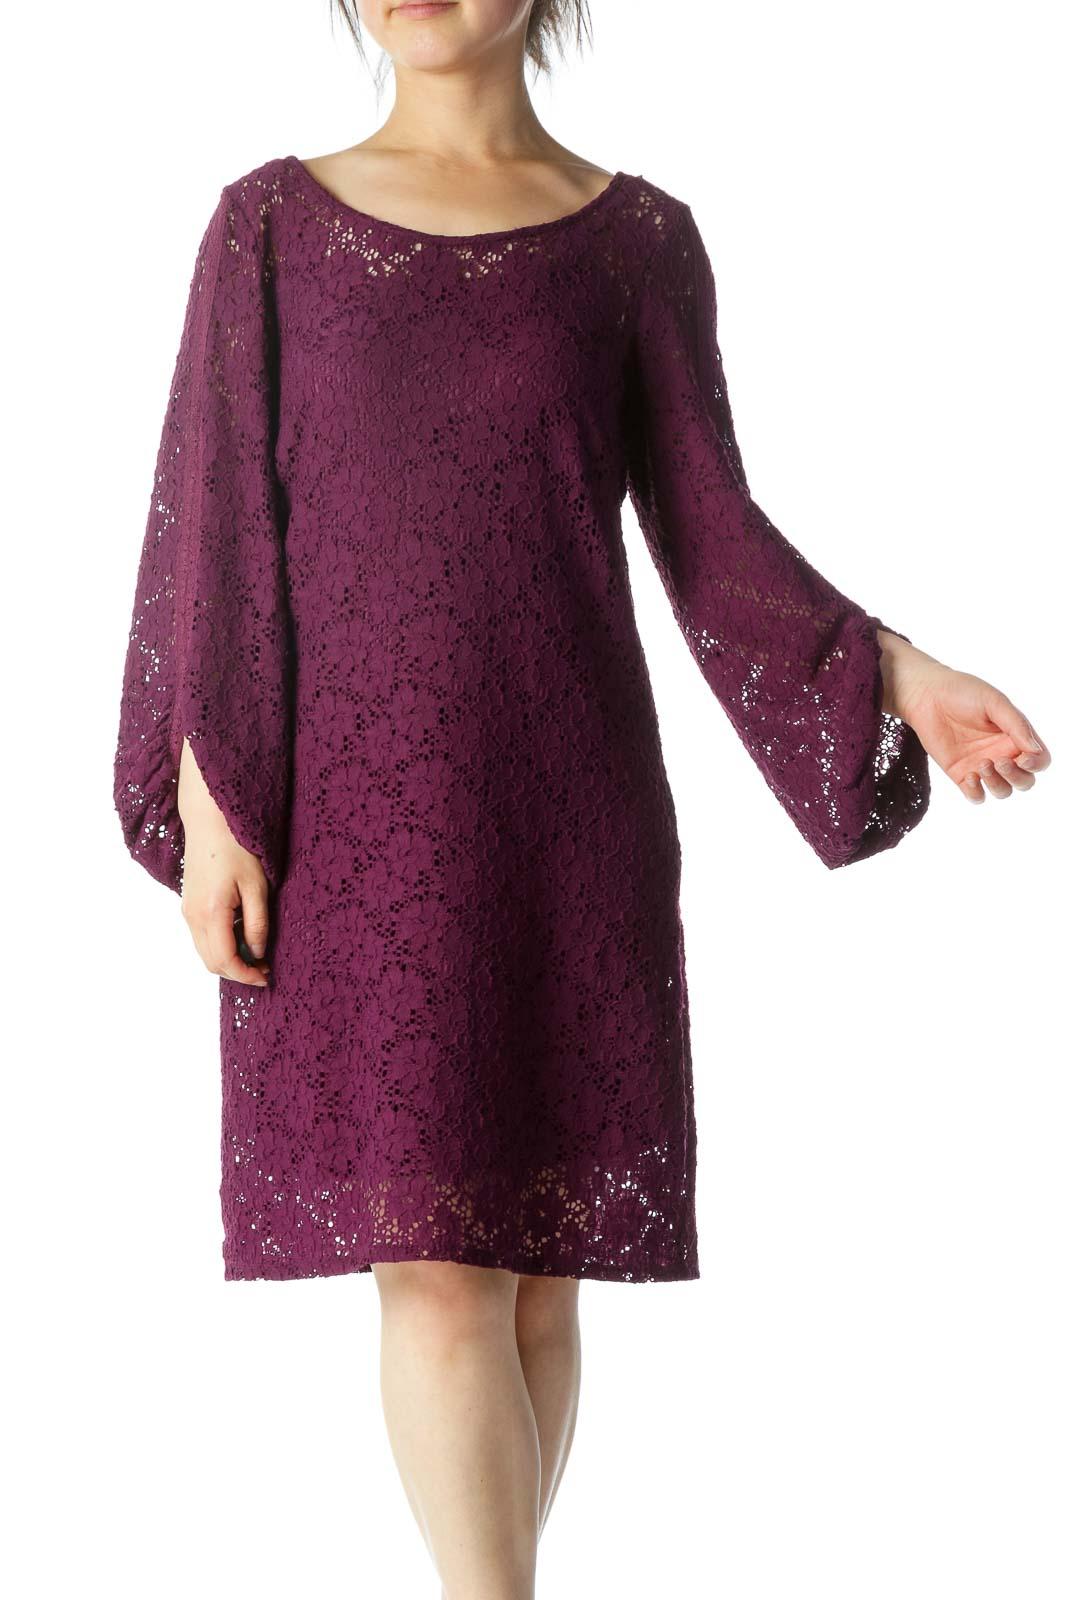 Purple Lace Work Dress Front